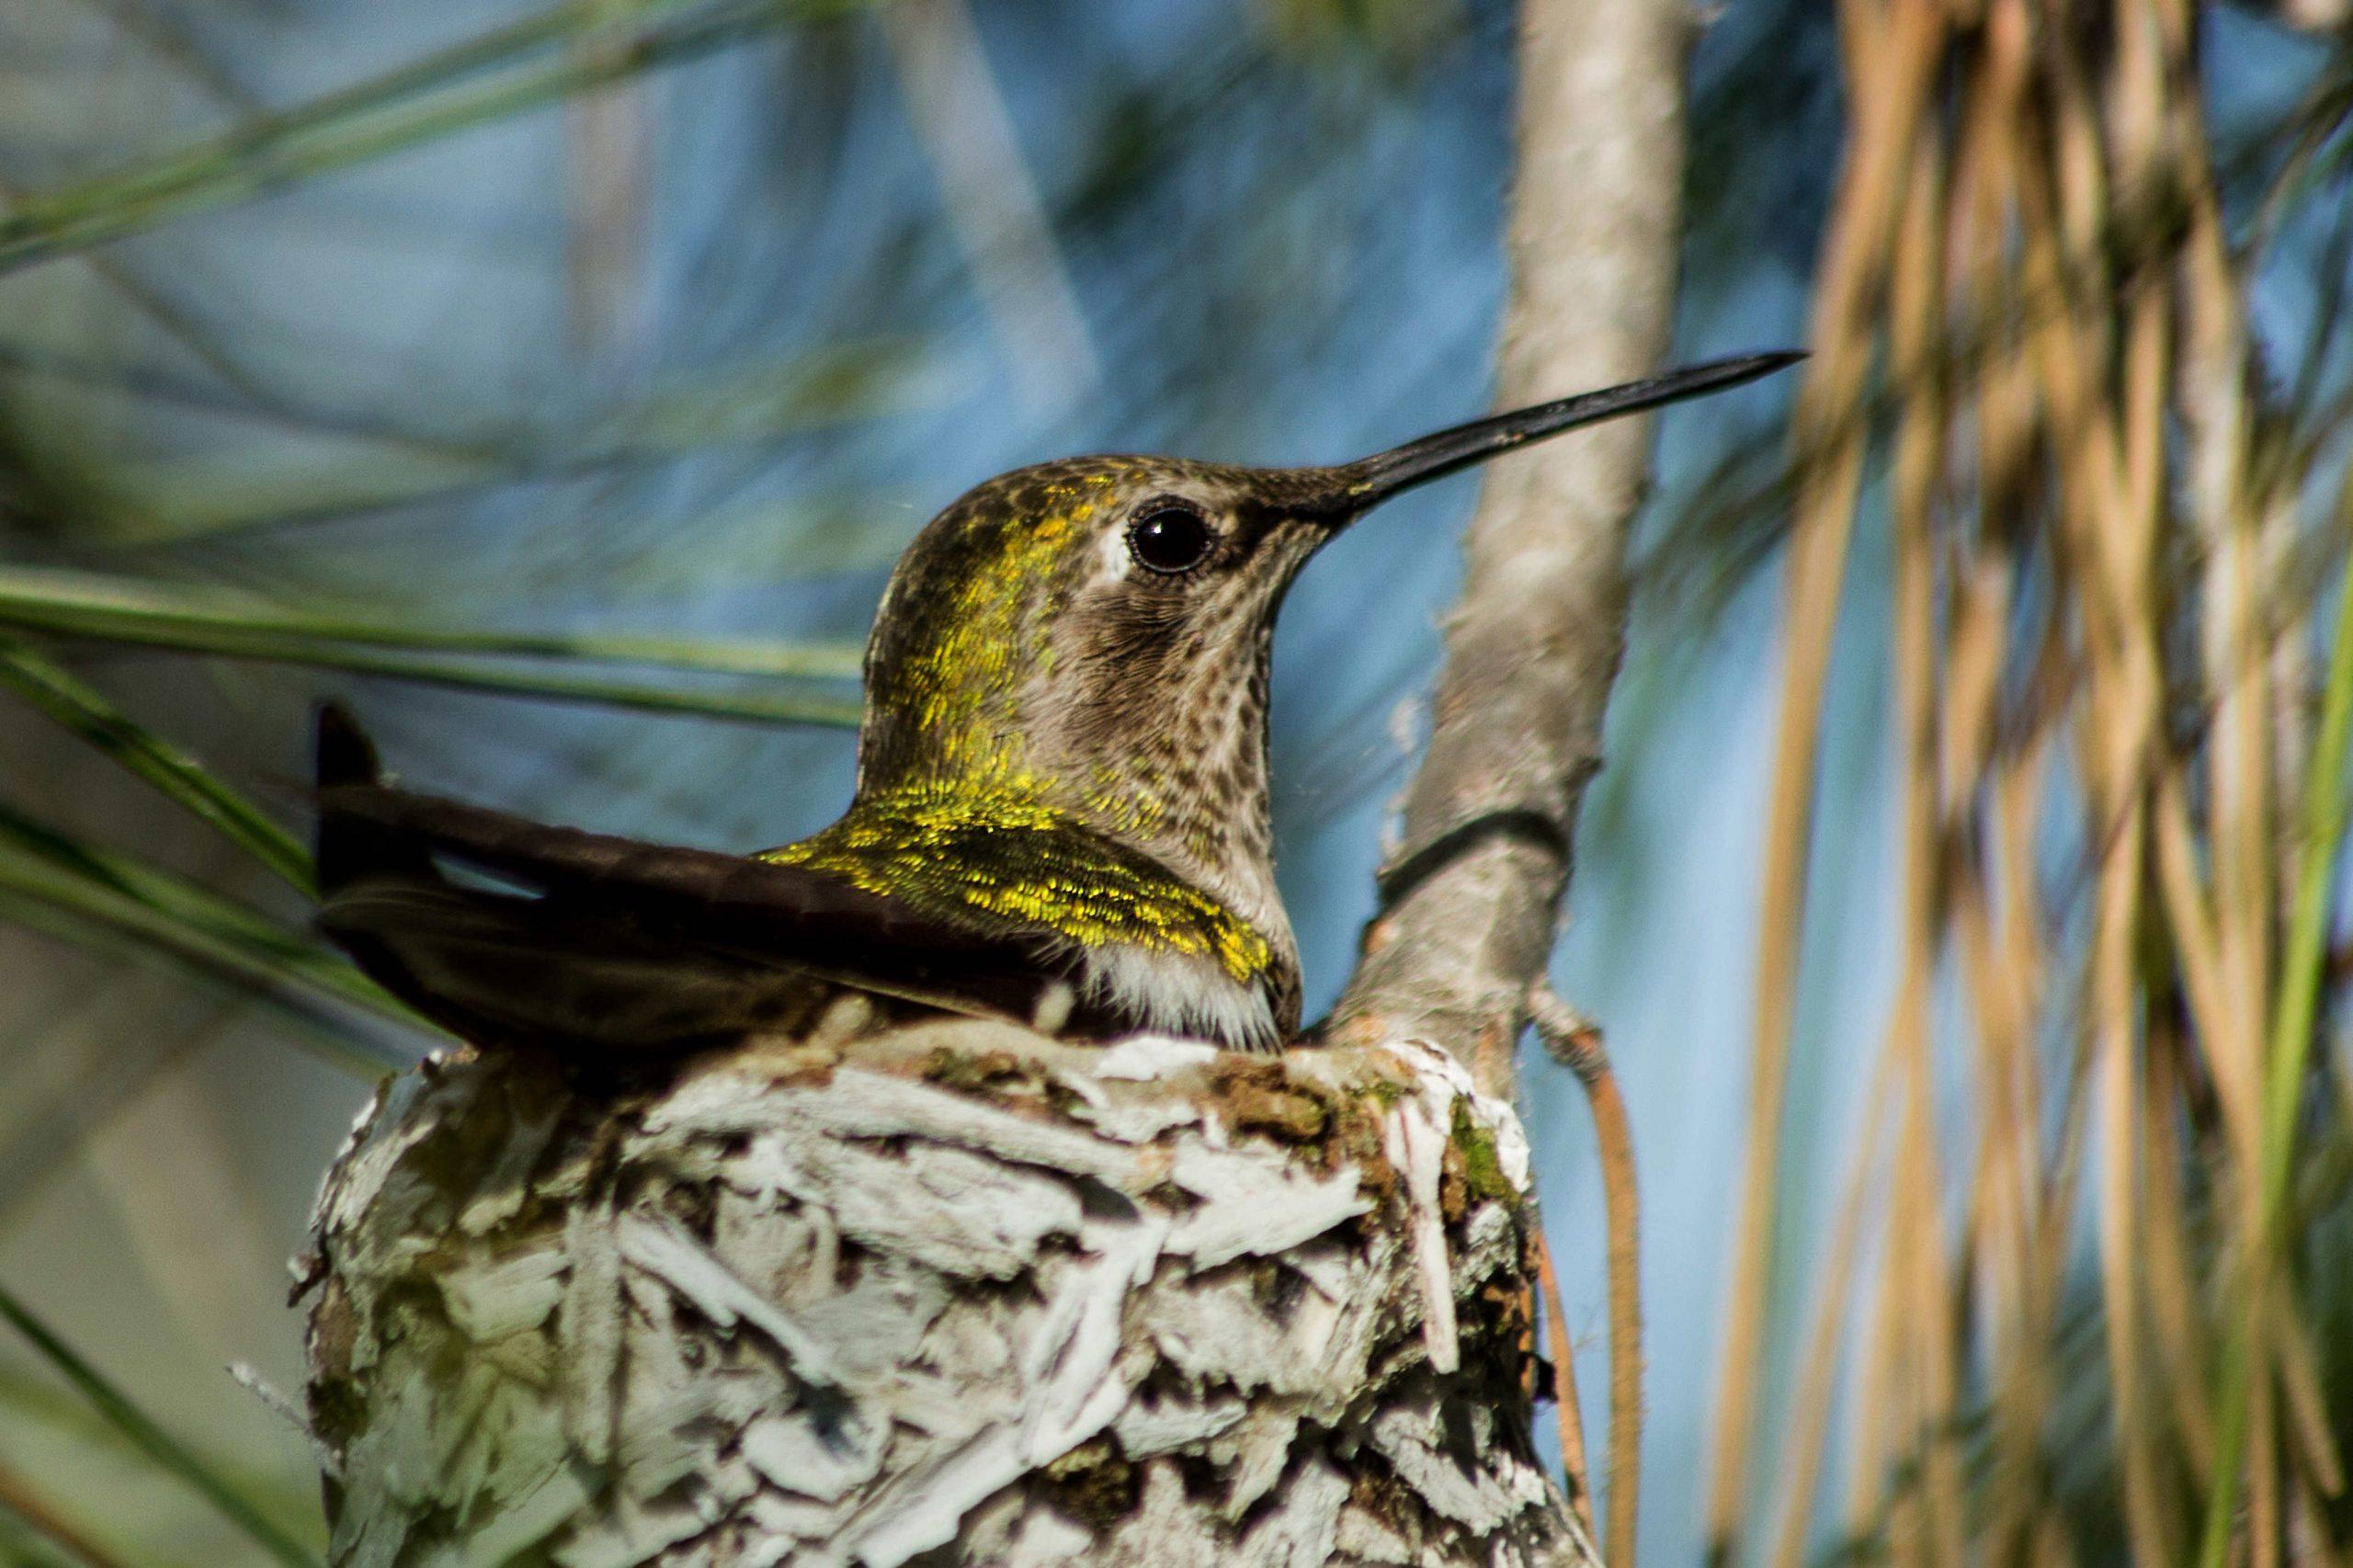 Colibrì nel nido